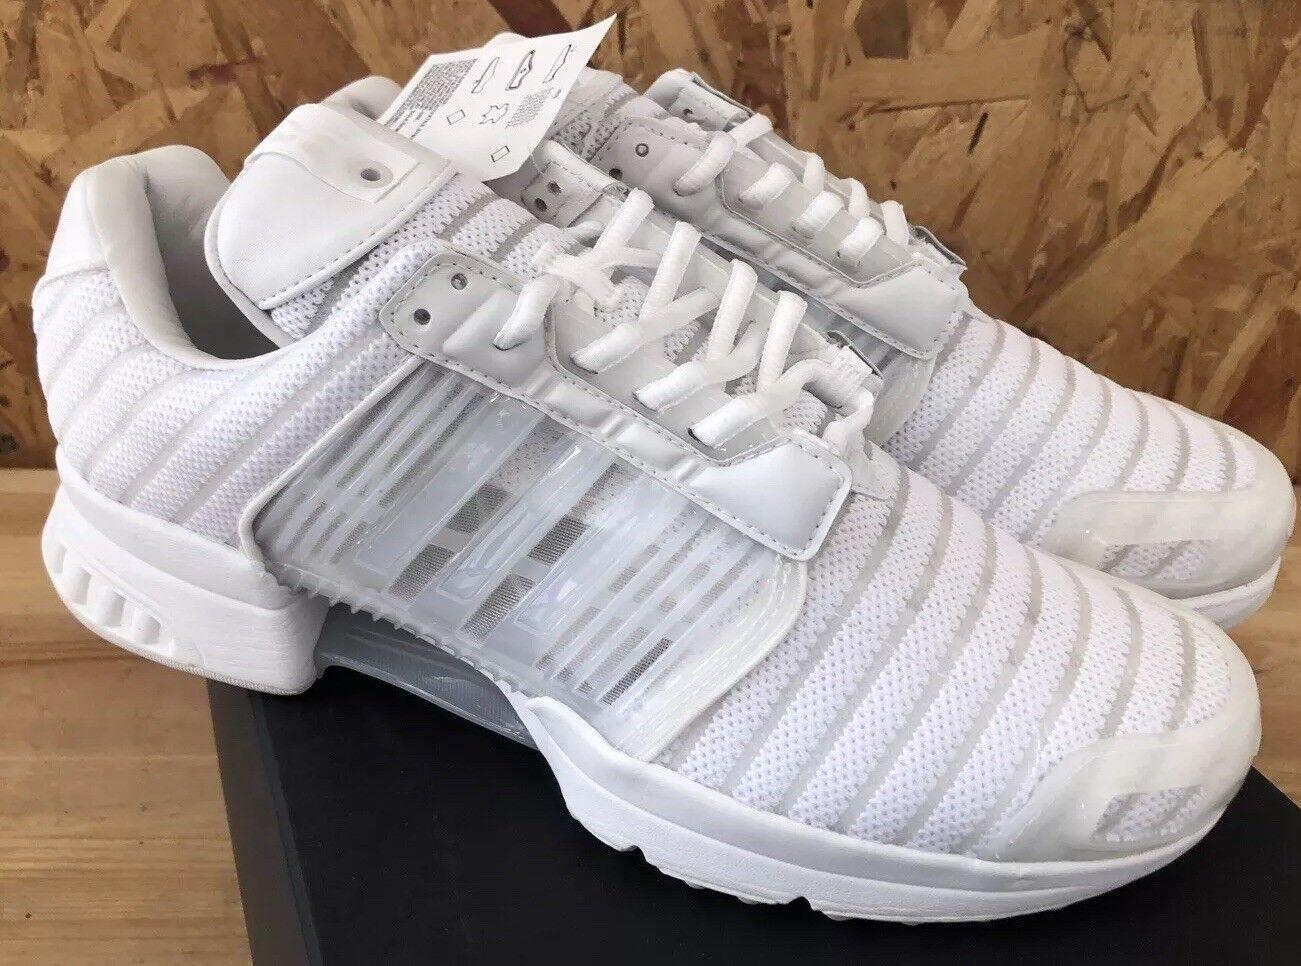 Adidas Climacool 1 S.E.Sneakerboy X Souhaitez White Sz 12 NIB BY3053